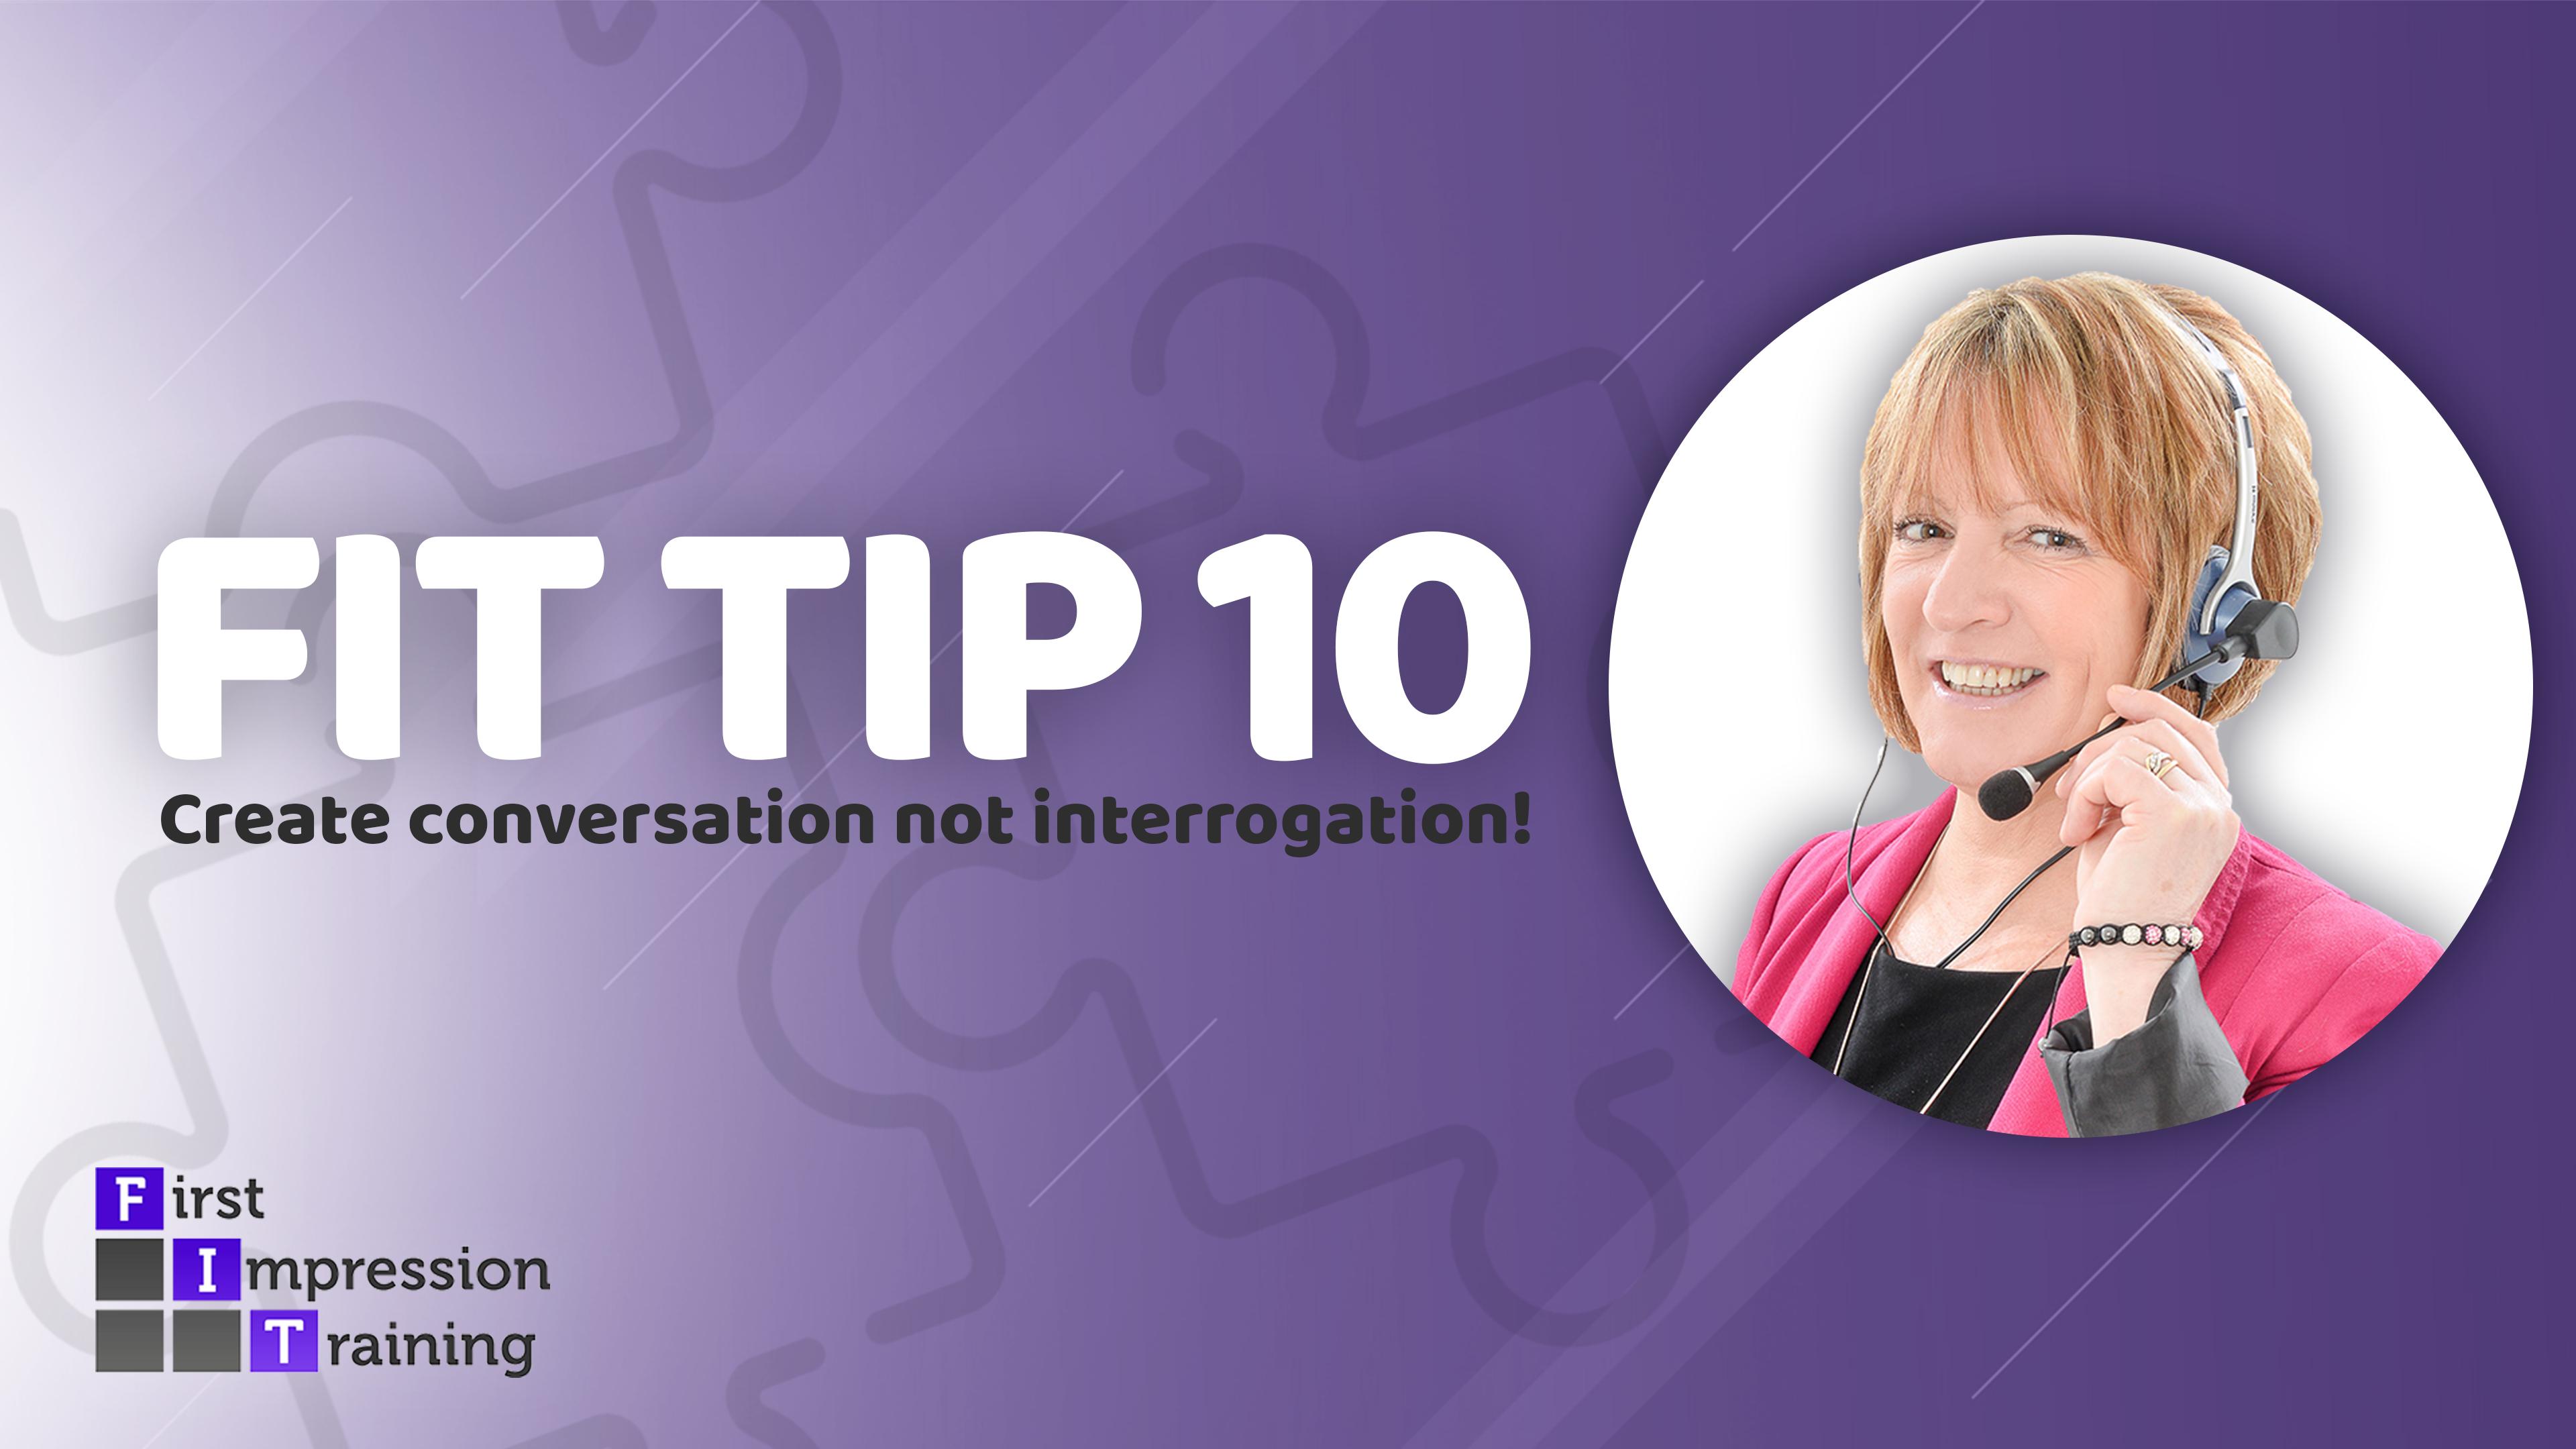 Create conversation, not interrogation!